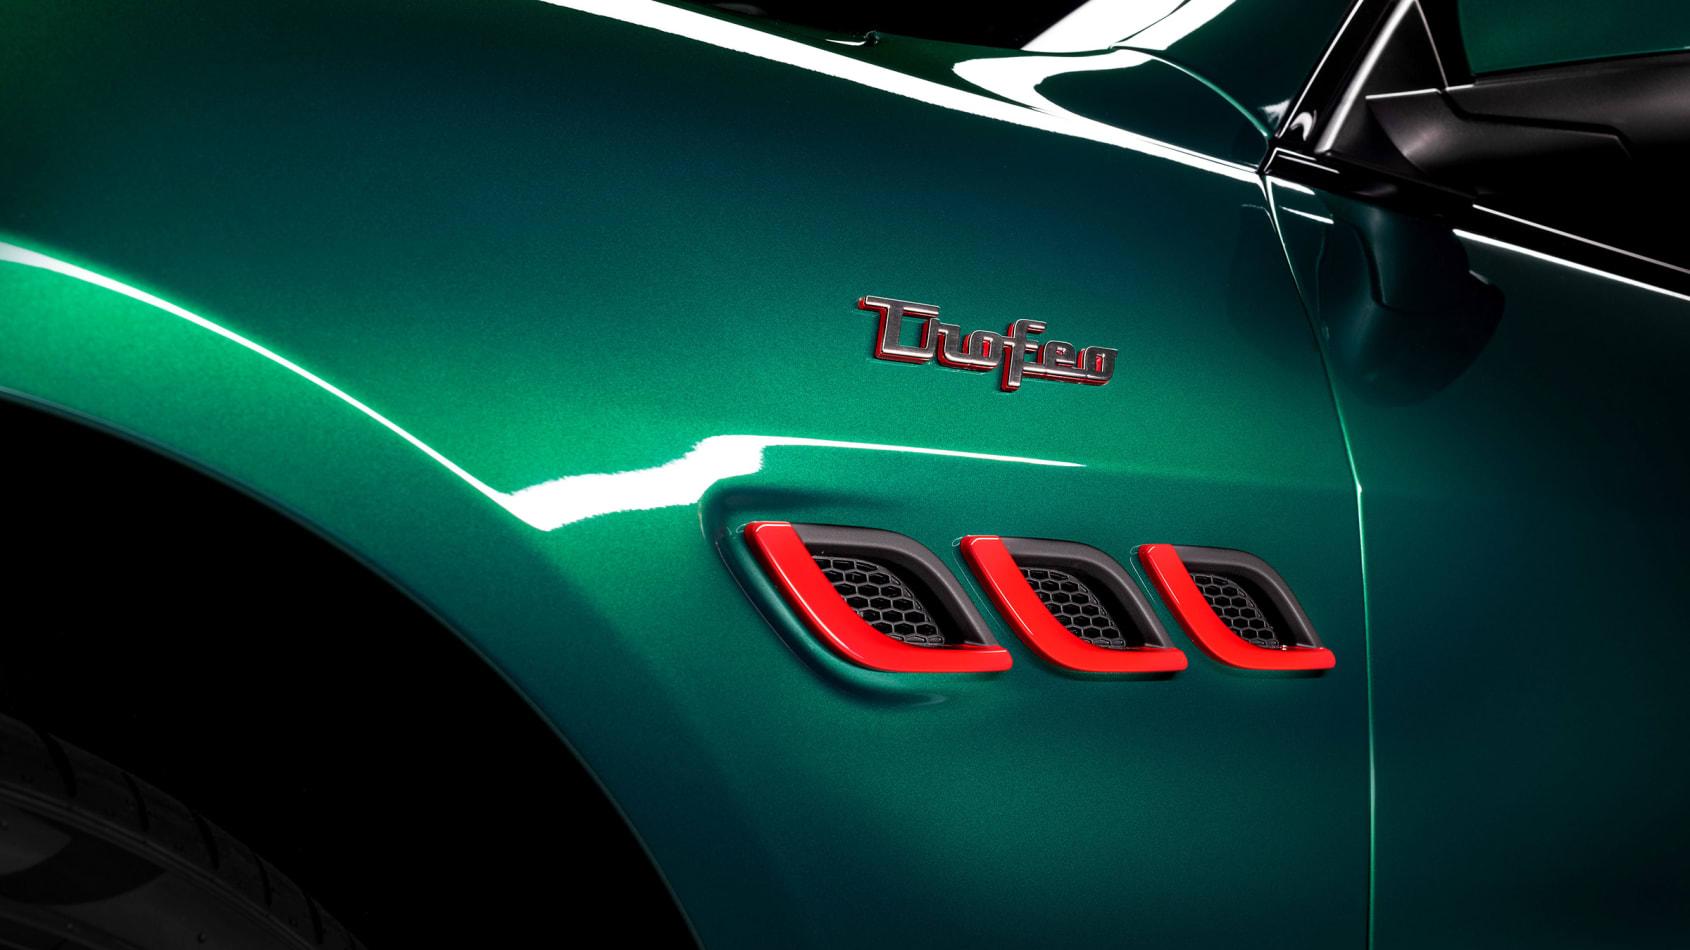 [Image: Maserati%20Quattroporte%20Trofeo-5.jpg]